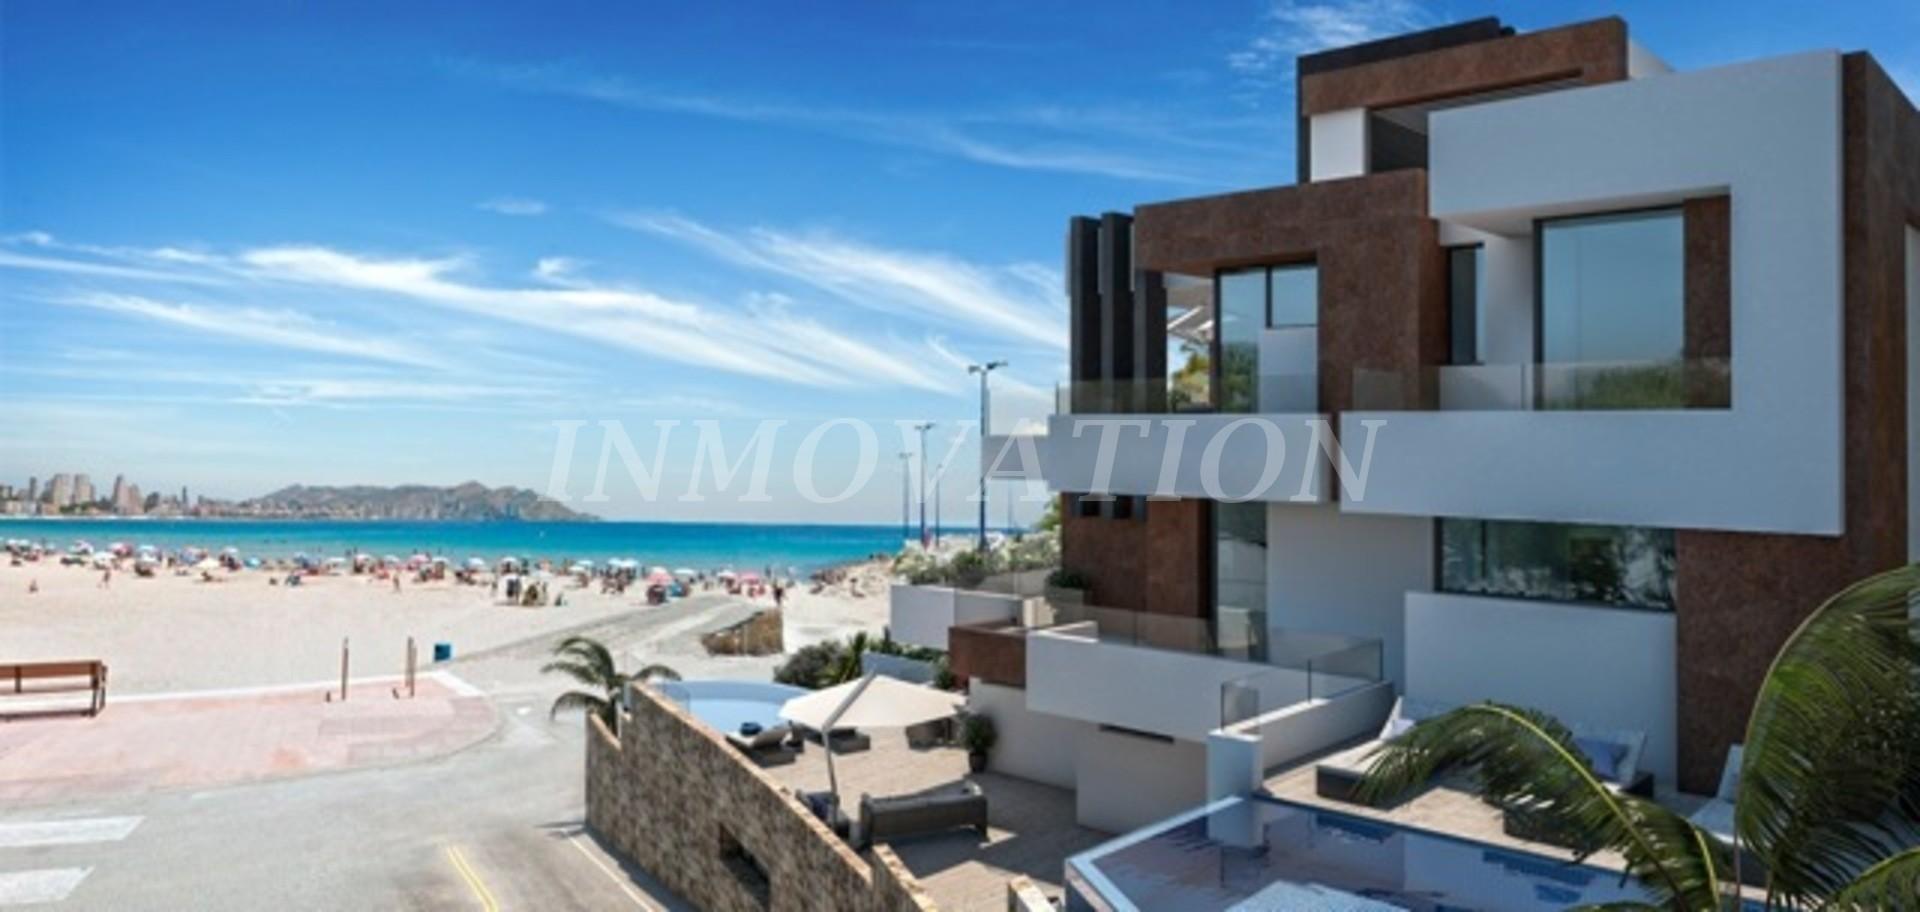 Previous Next New Luxury Beachfront Apartments Benidorm